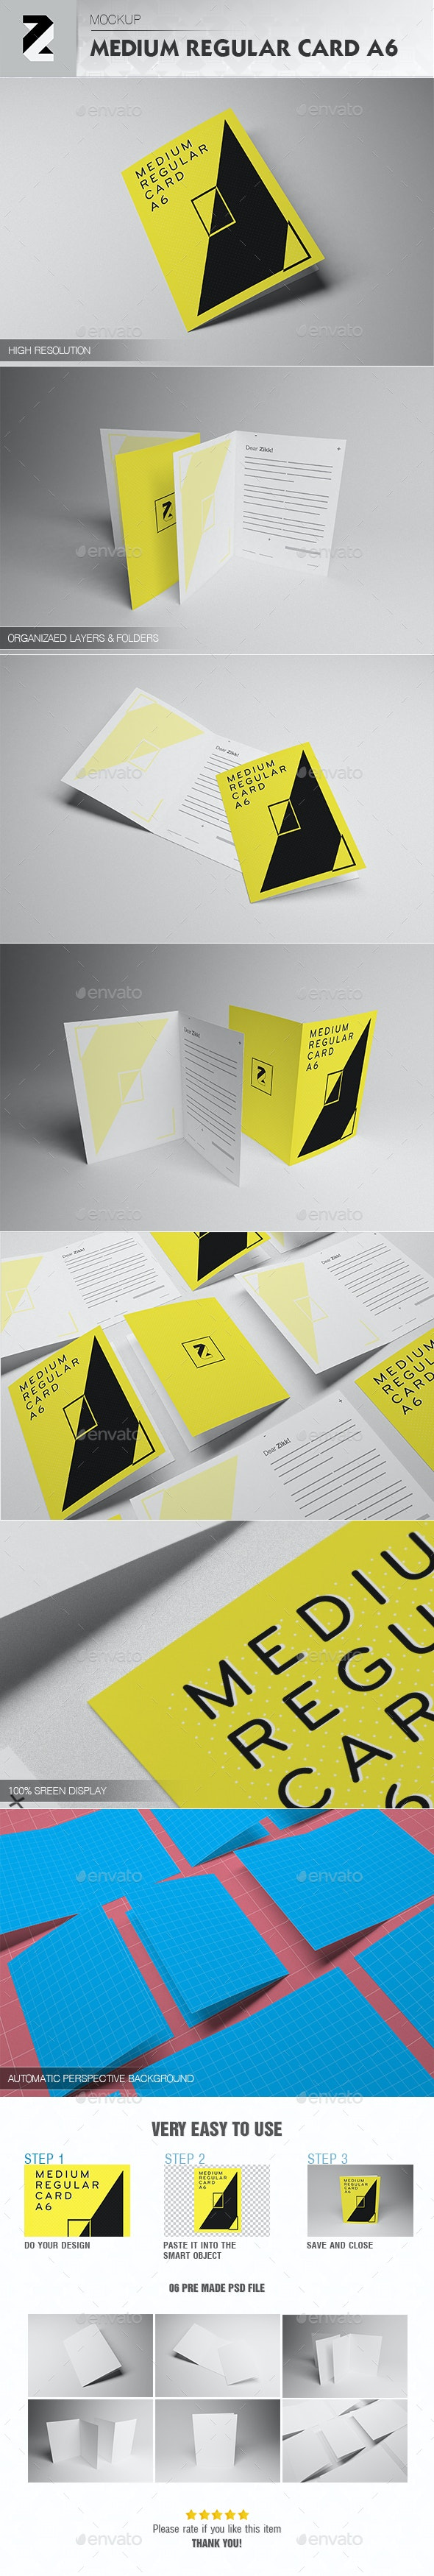 Medium Regular Card A6 Mockup - Brochures Print